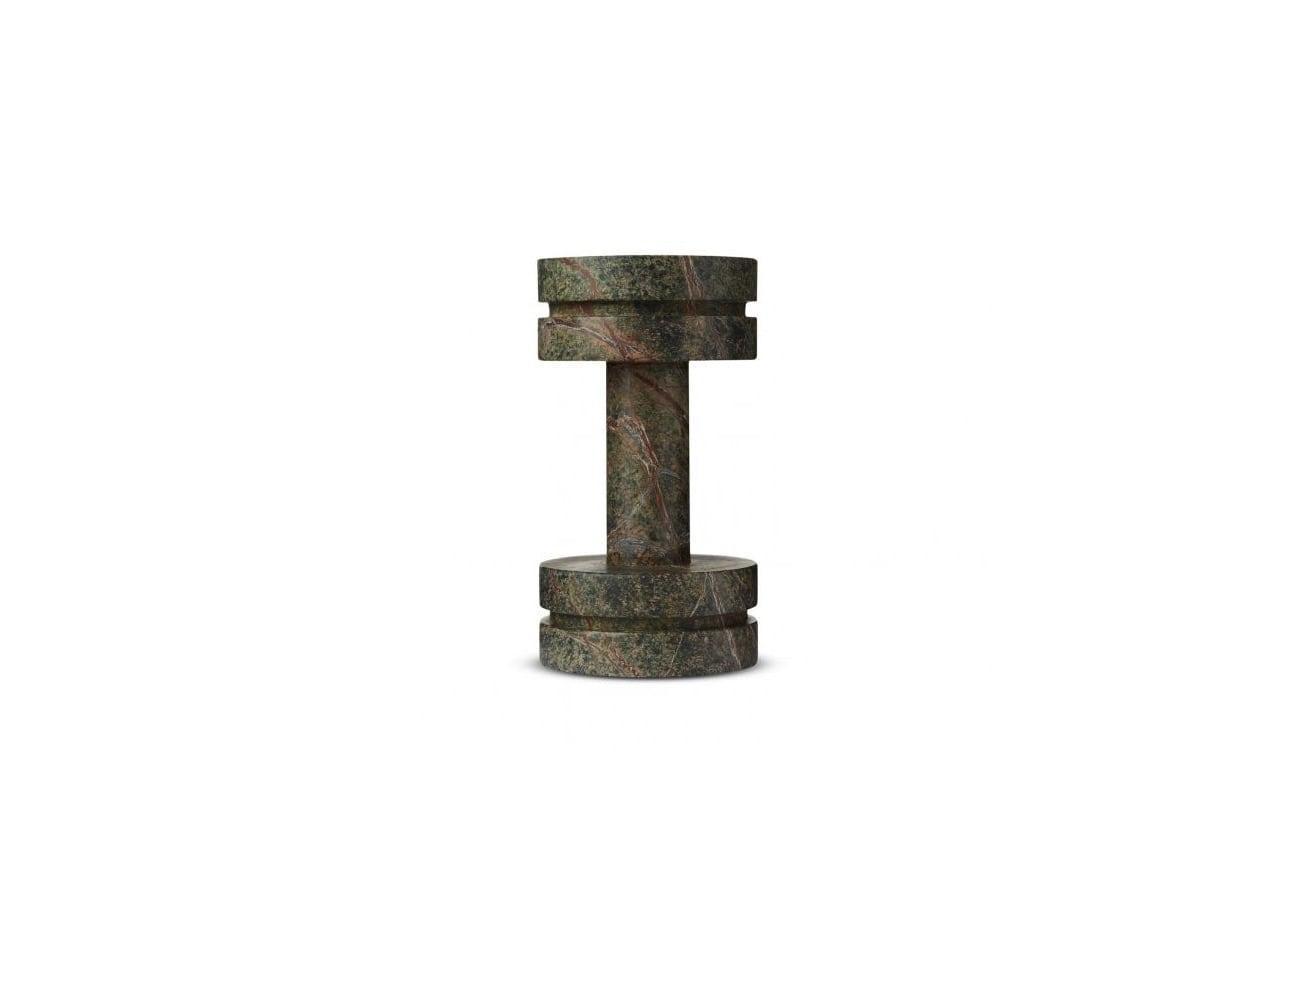 Tom Dixon Rock Weight Marble Dumbbell 187 Gadget Flow